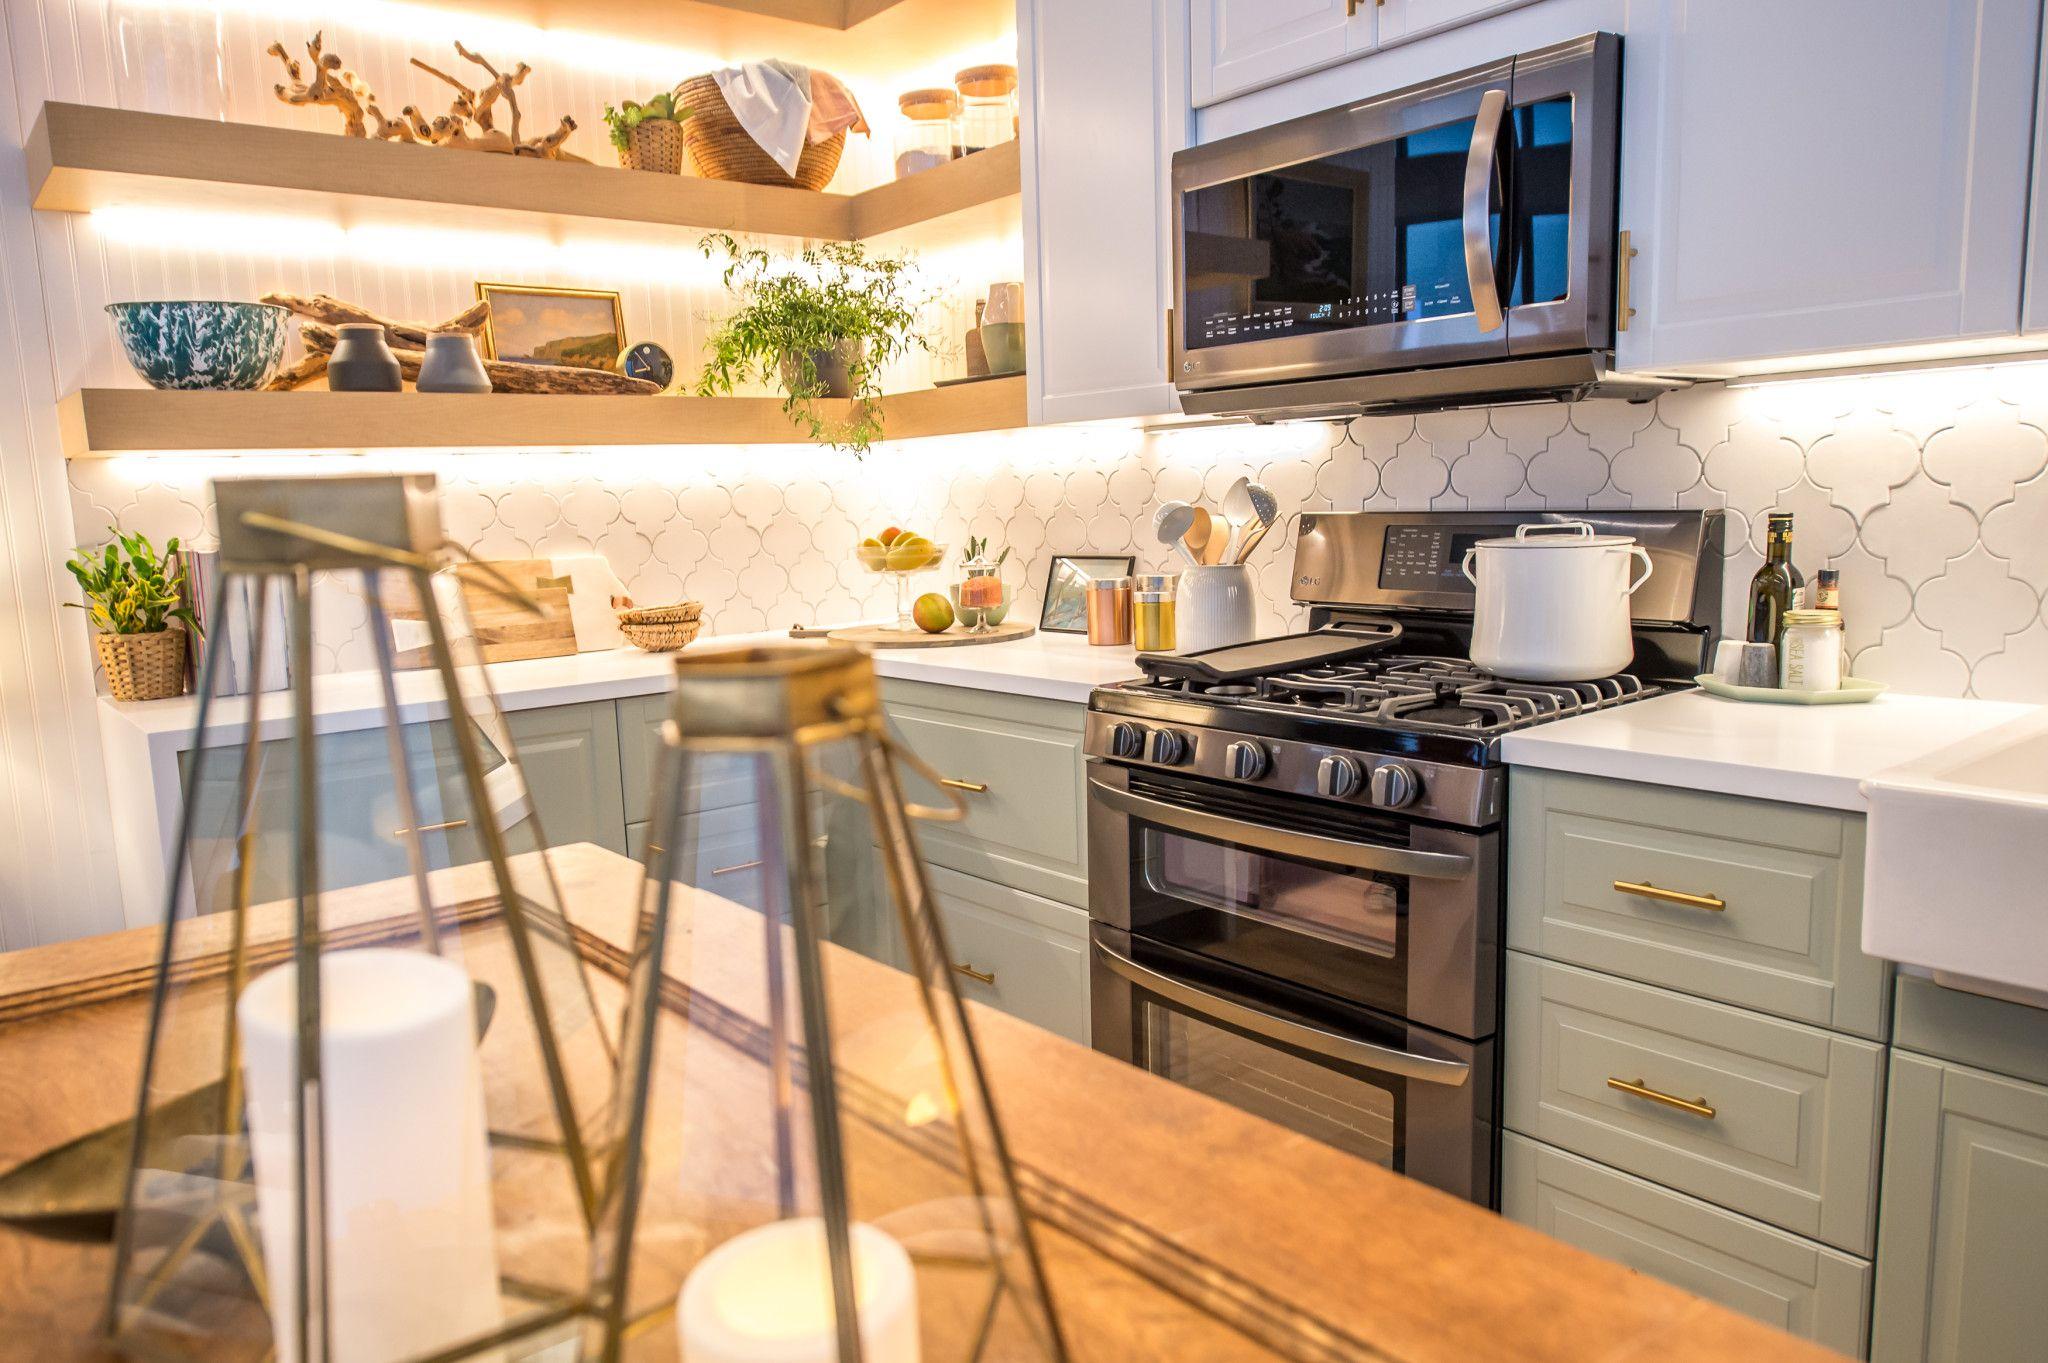 I LLOVE this kitchen!  #LGLimitlessDesign #Contest LG Limitless Design Contest with HGTV